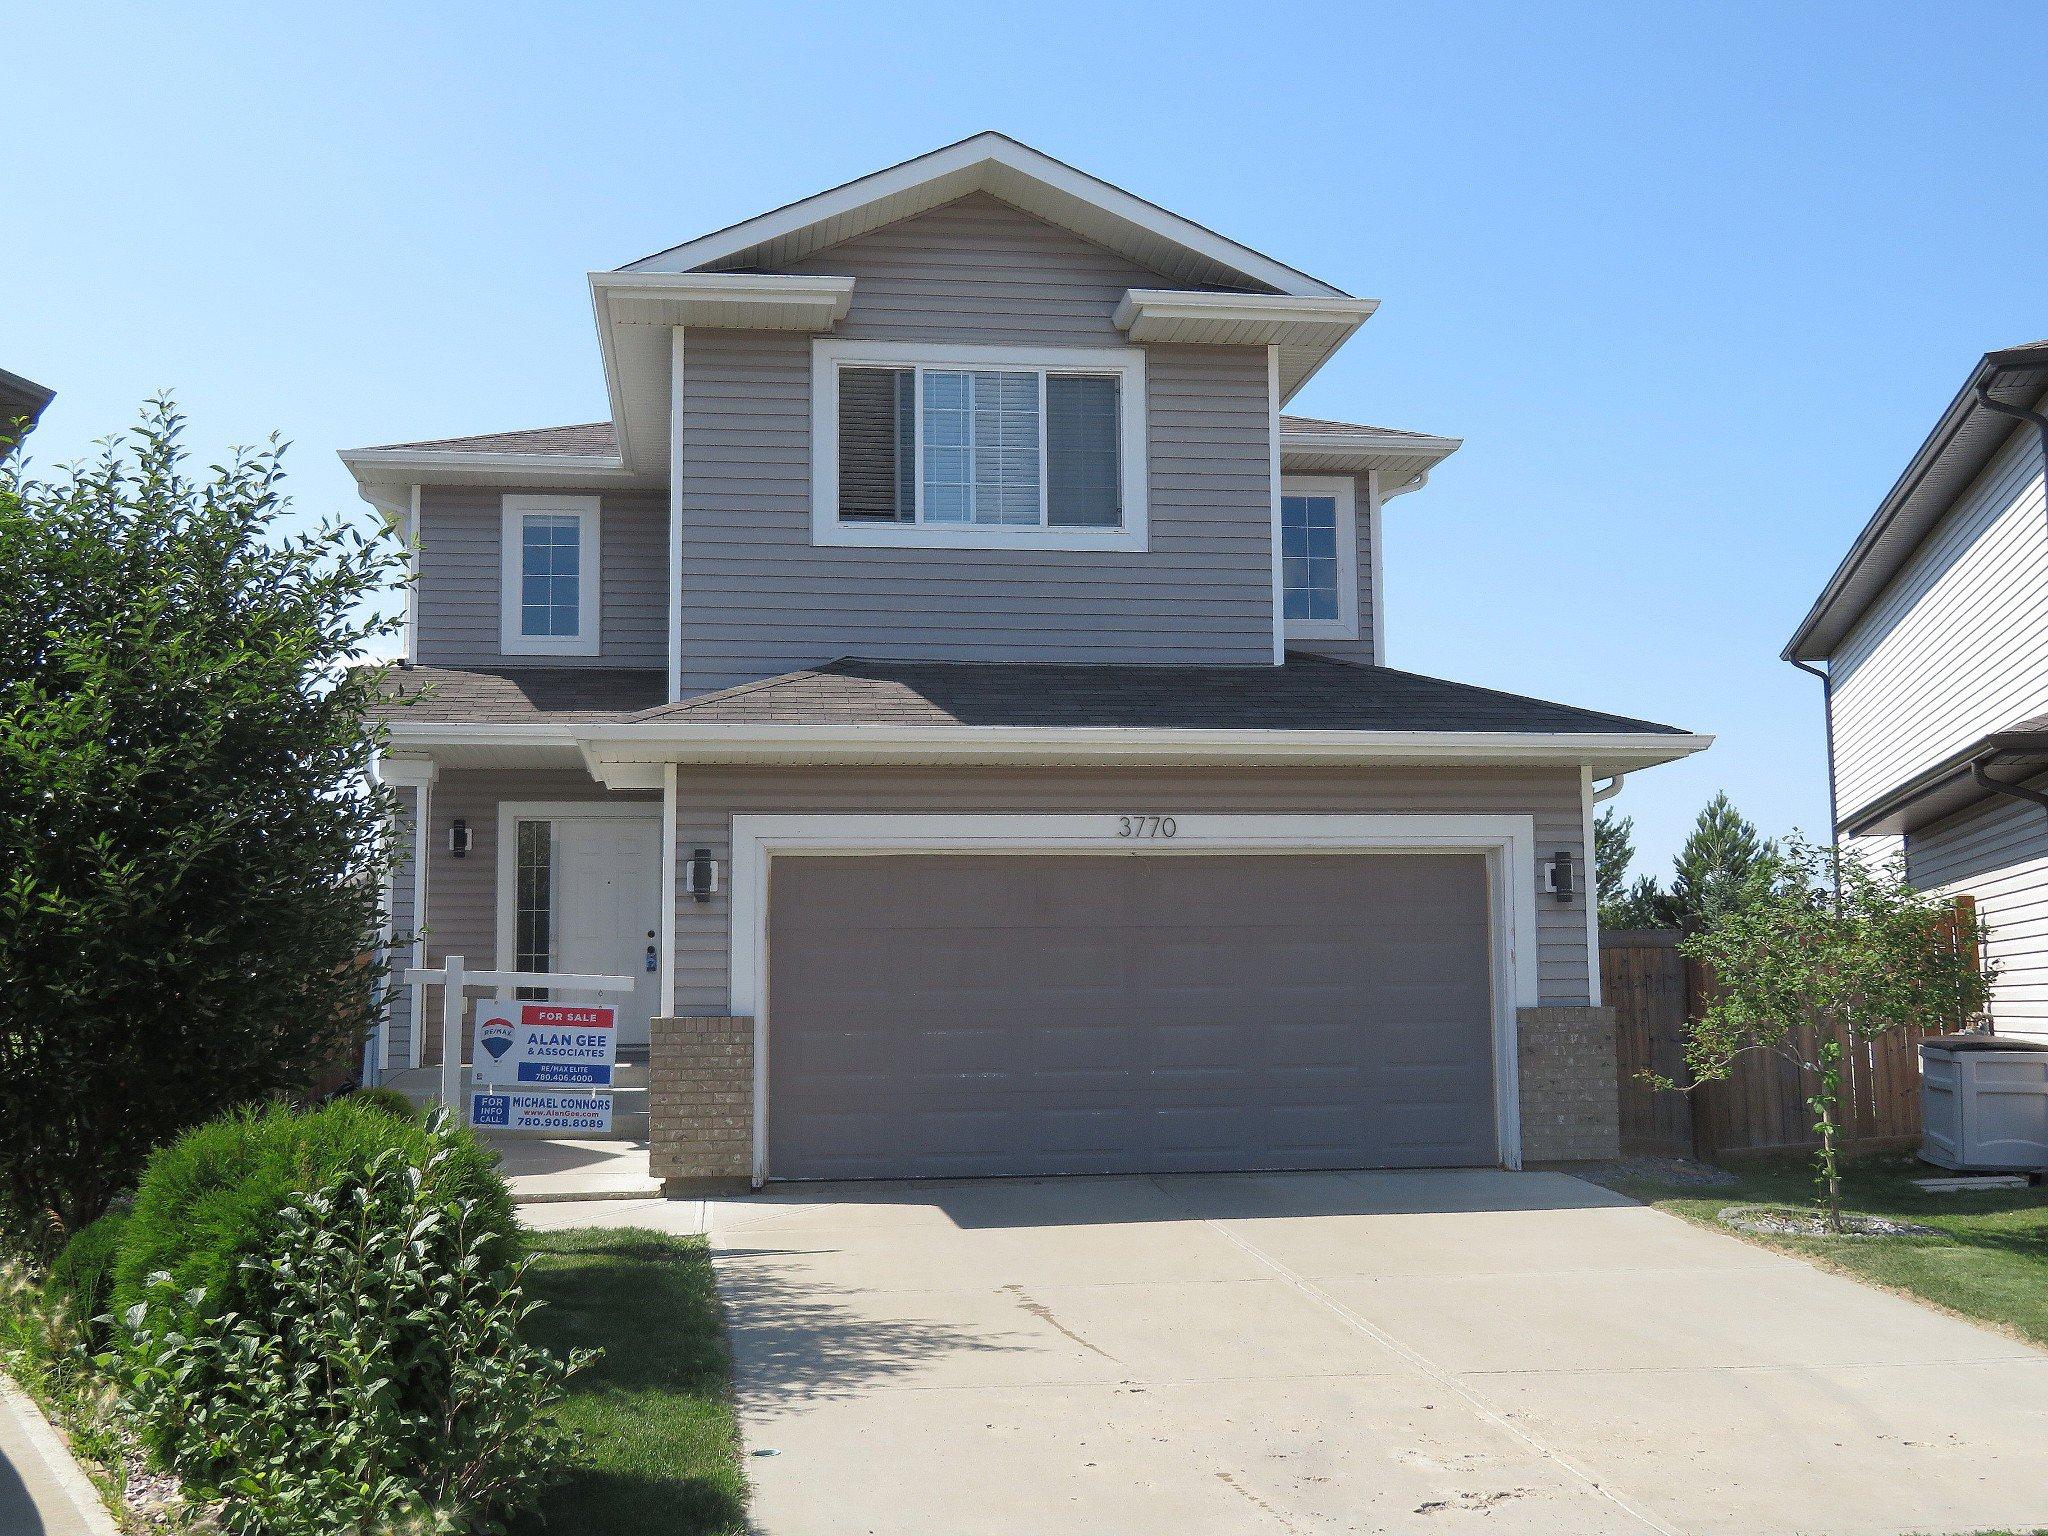 Main Photo: 3770 13 Street NW: Edmonton House for sale : MLS®# E4120517